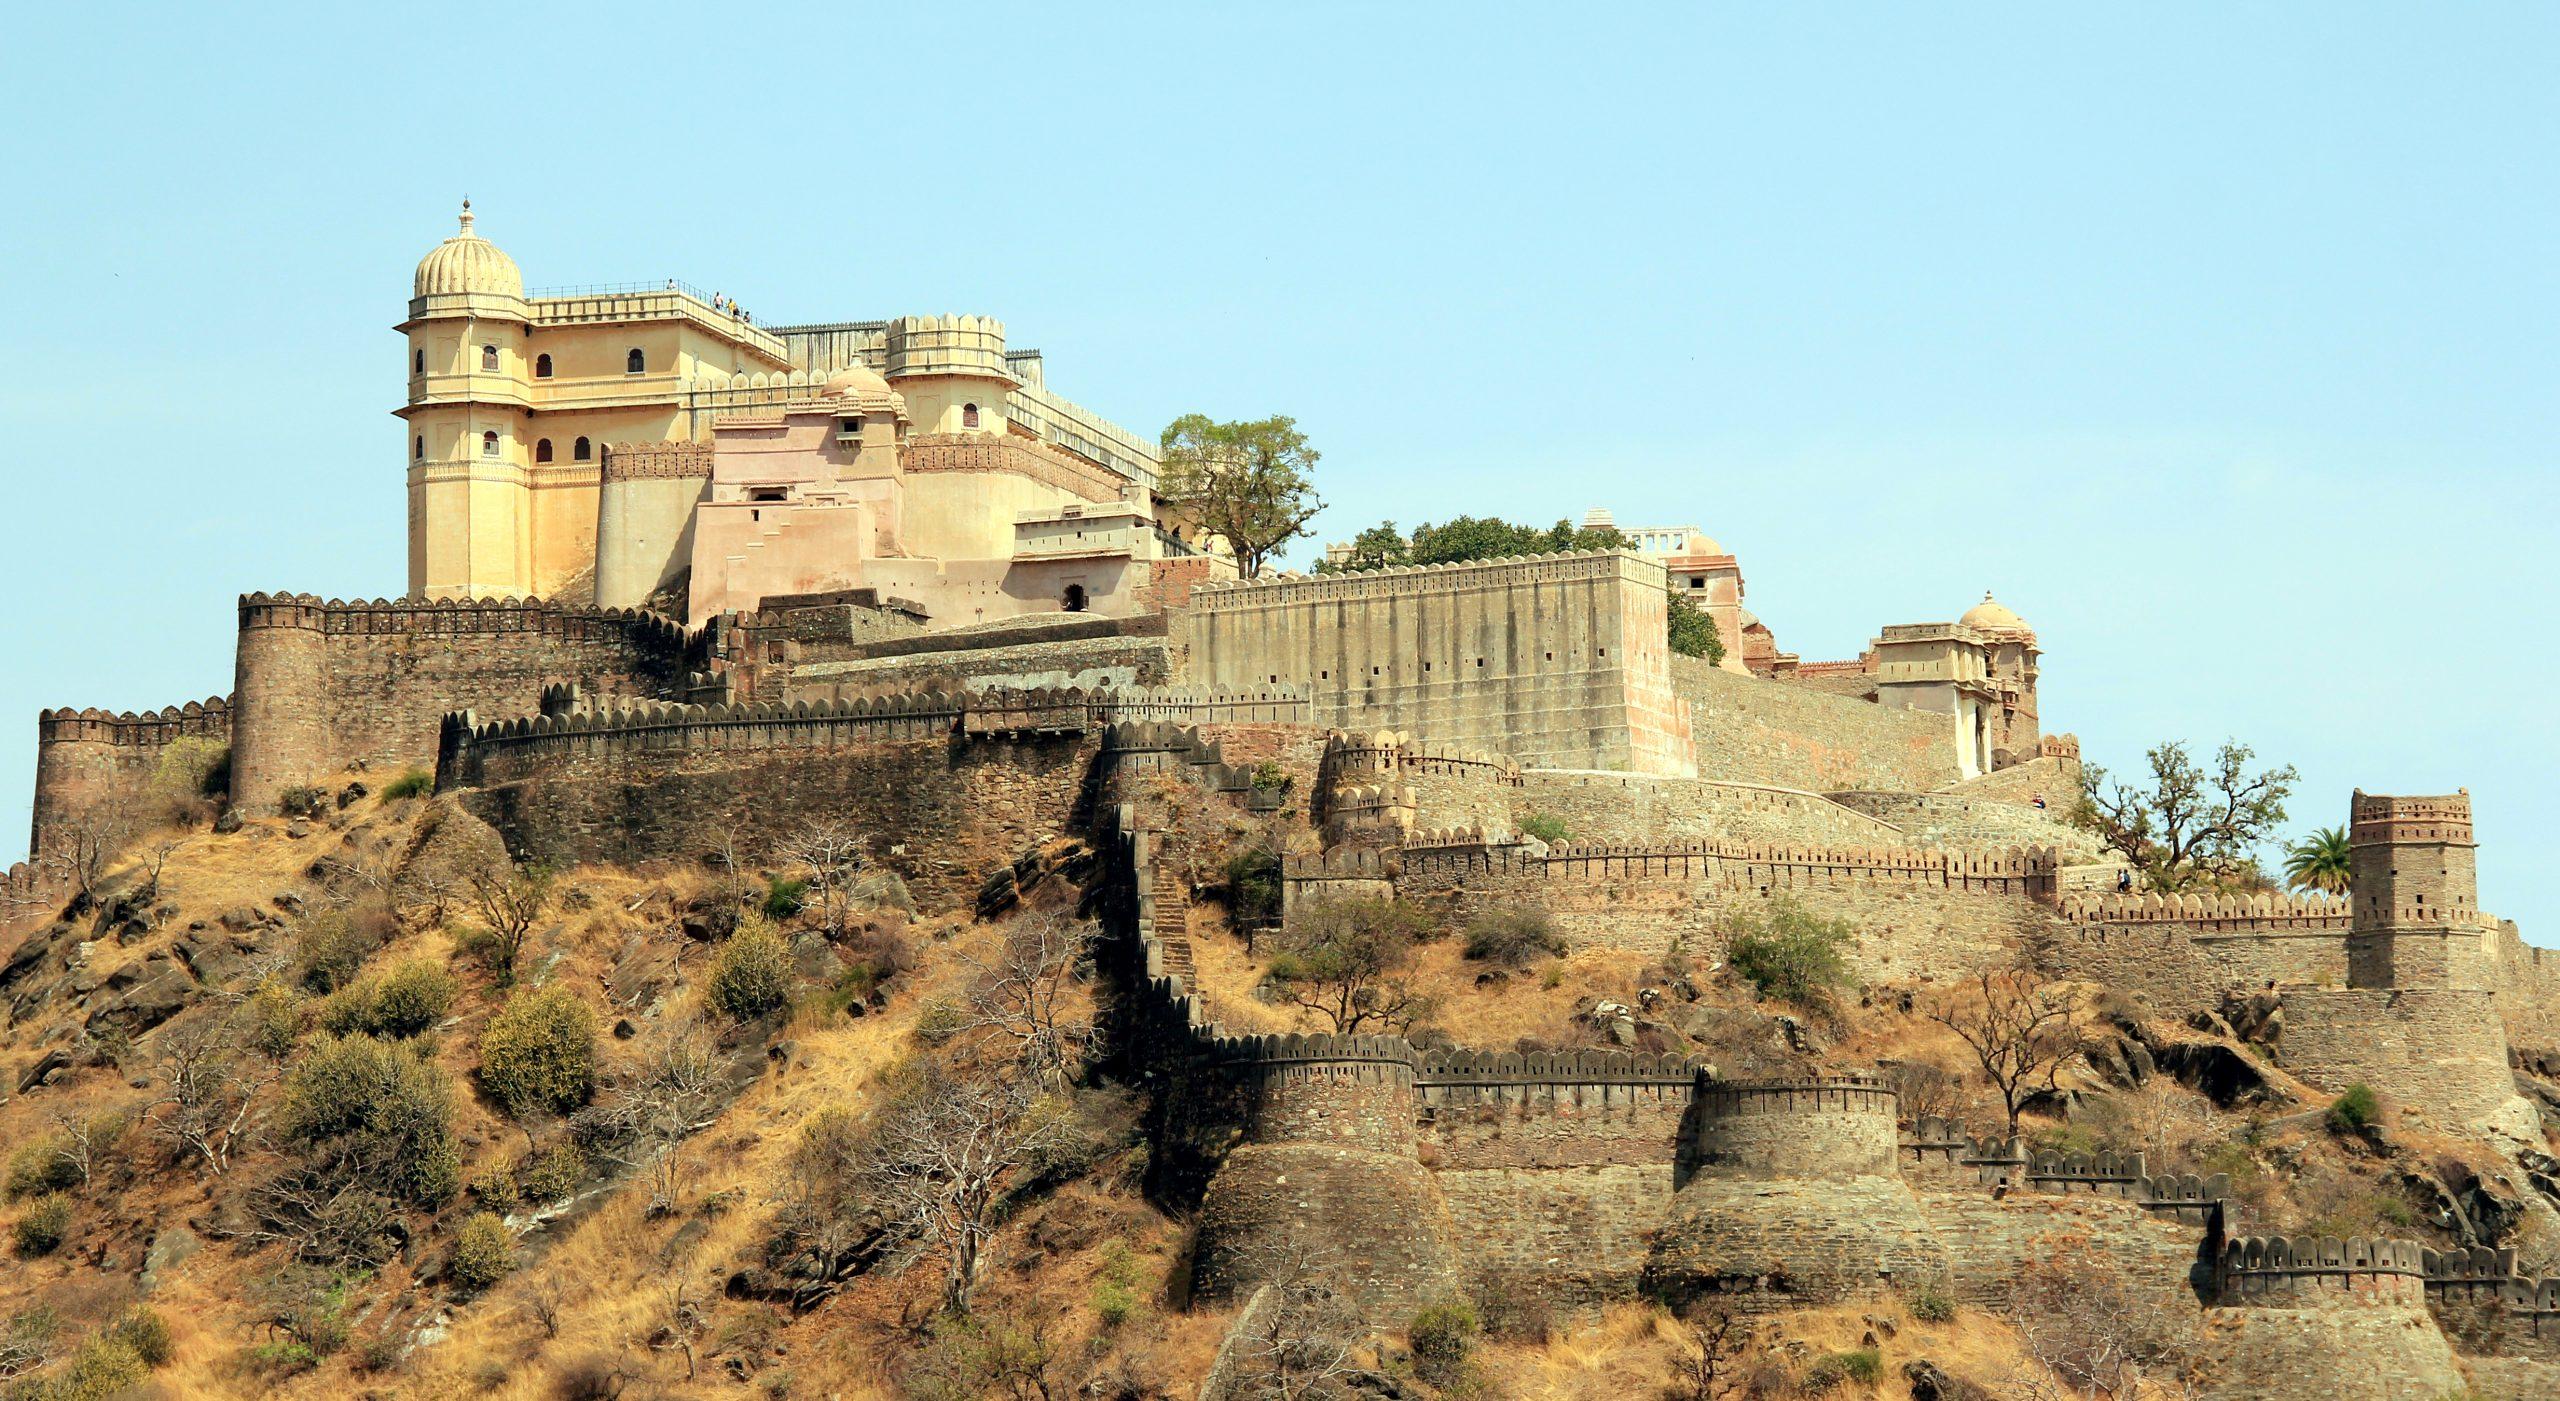 Kumbhalgarh Fort Offbeat Destinations When Touring Rajasthan